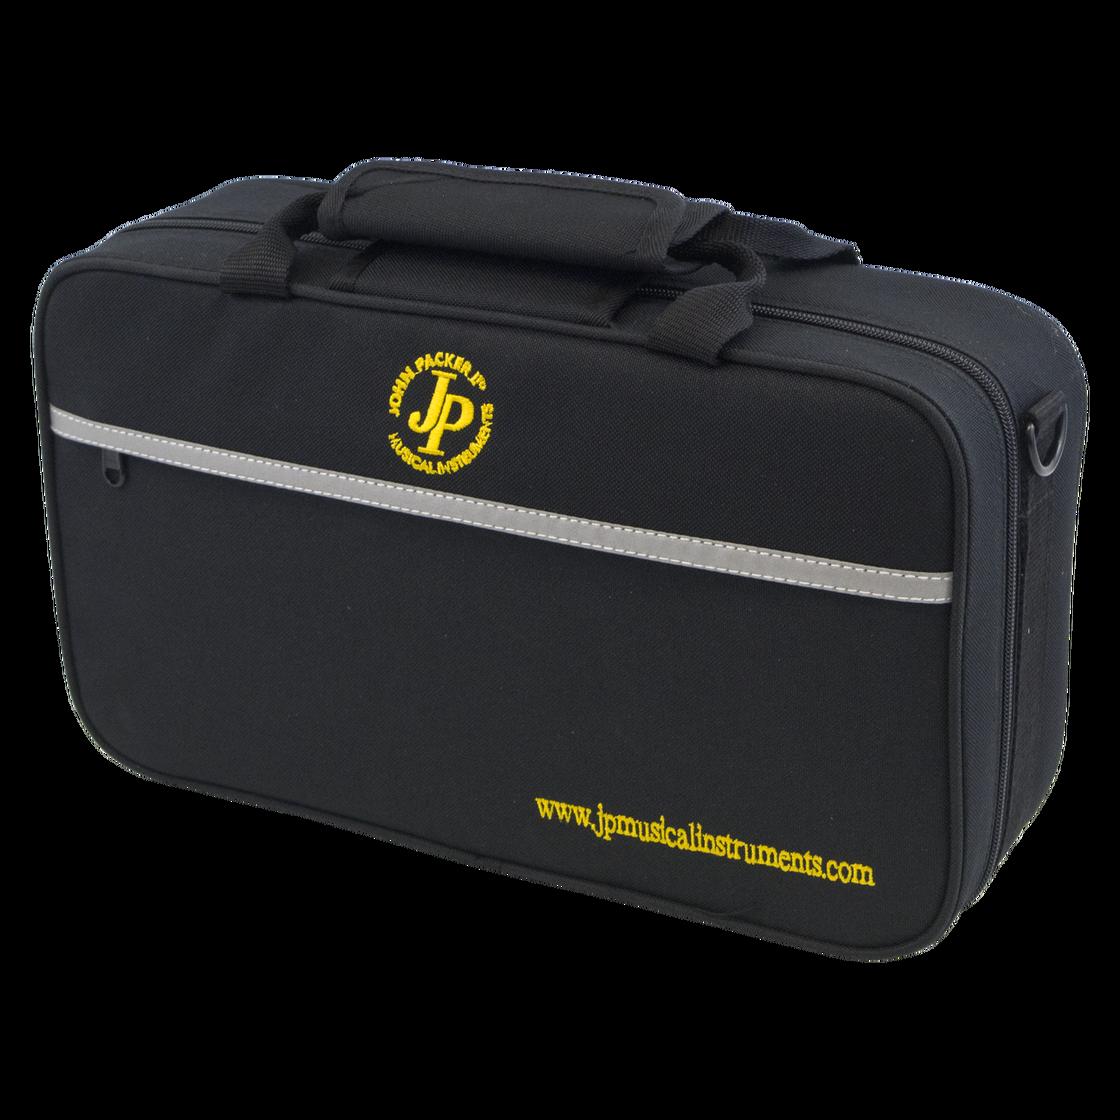 John Packer JP8021 Bb Clarinet Case